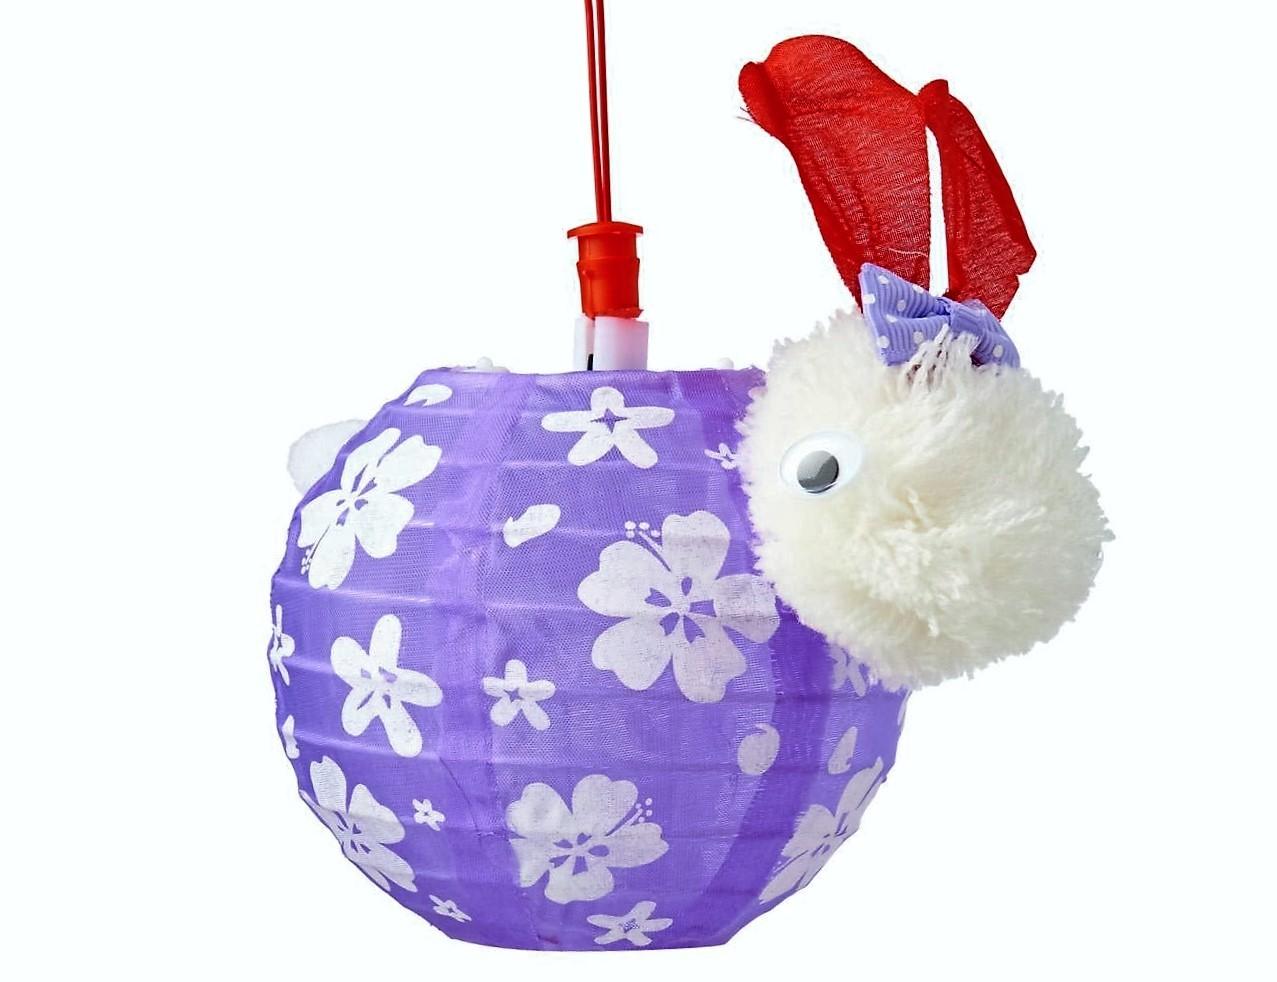 Wan Qing Mid-Autumn Festival - Jade Rabbit Lantern workshop